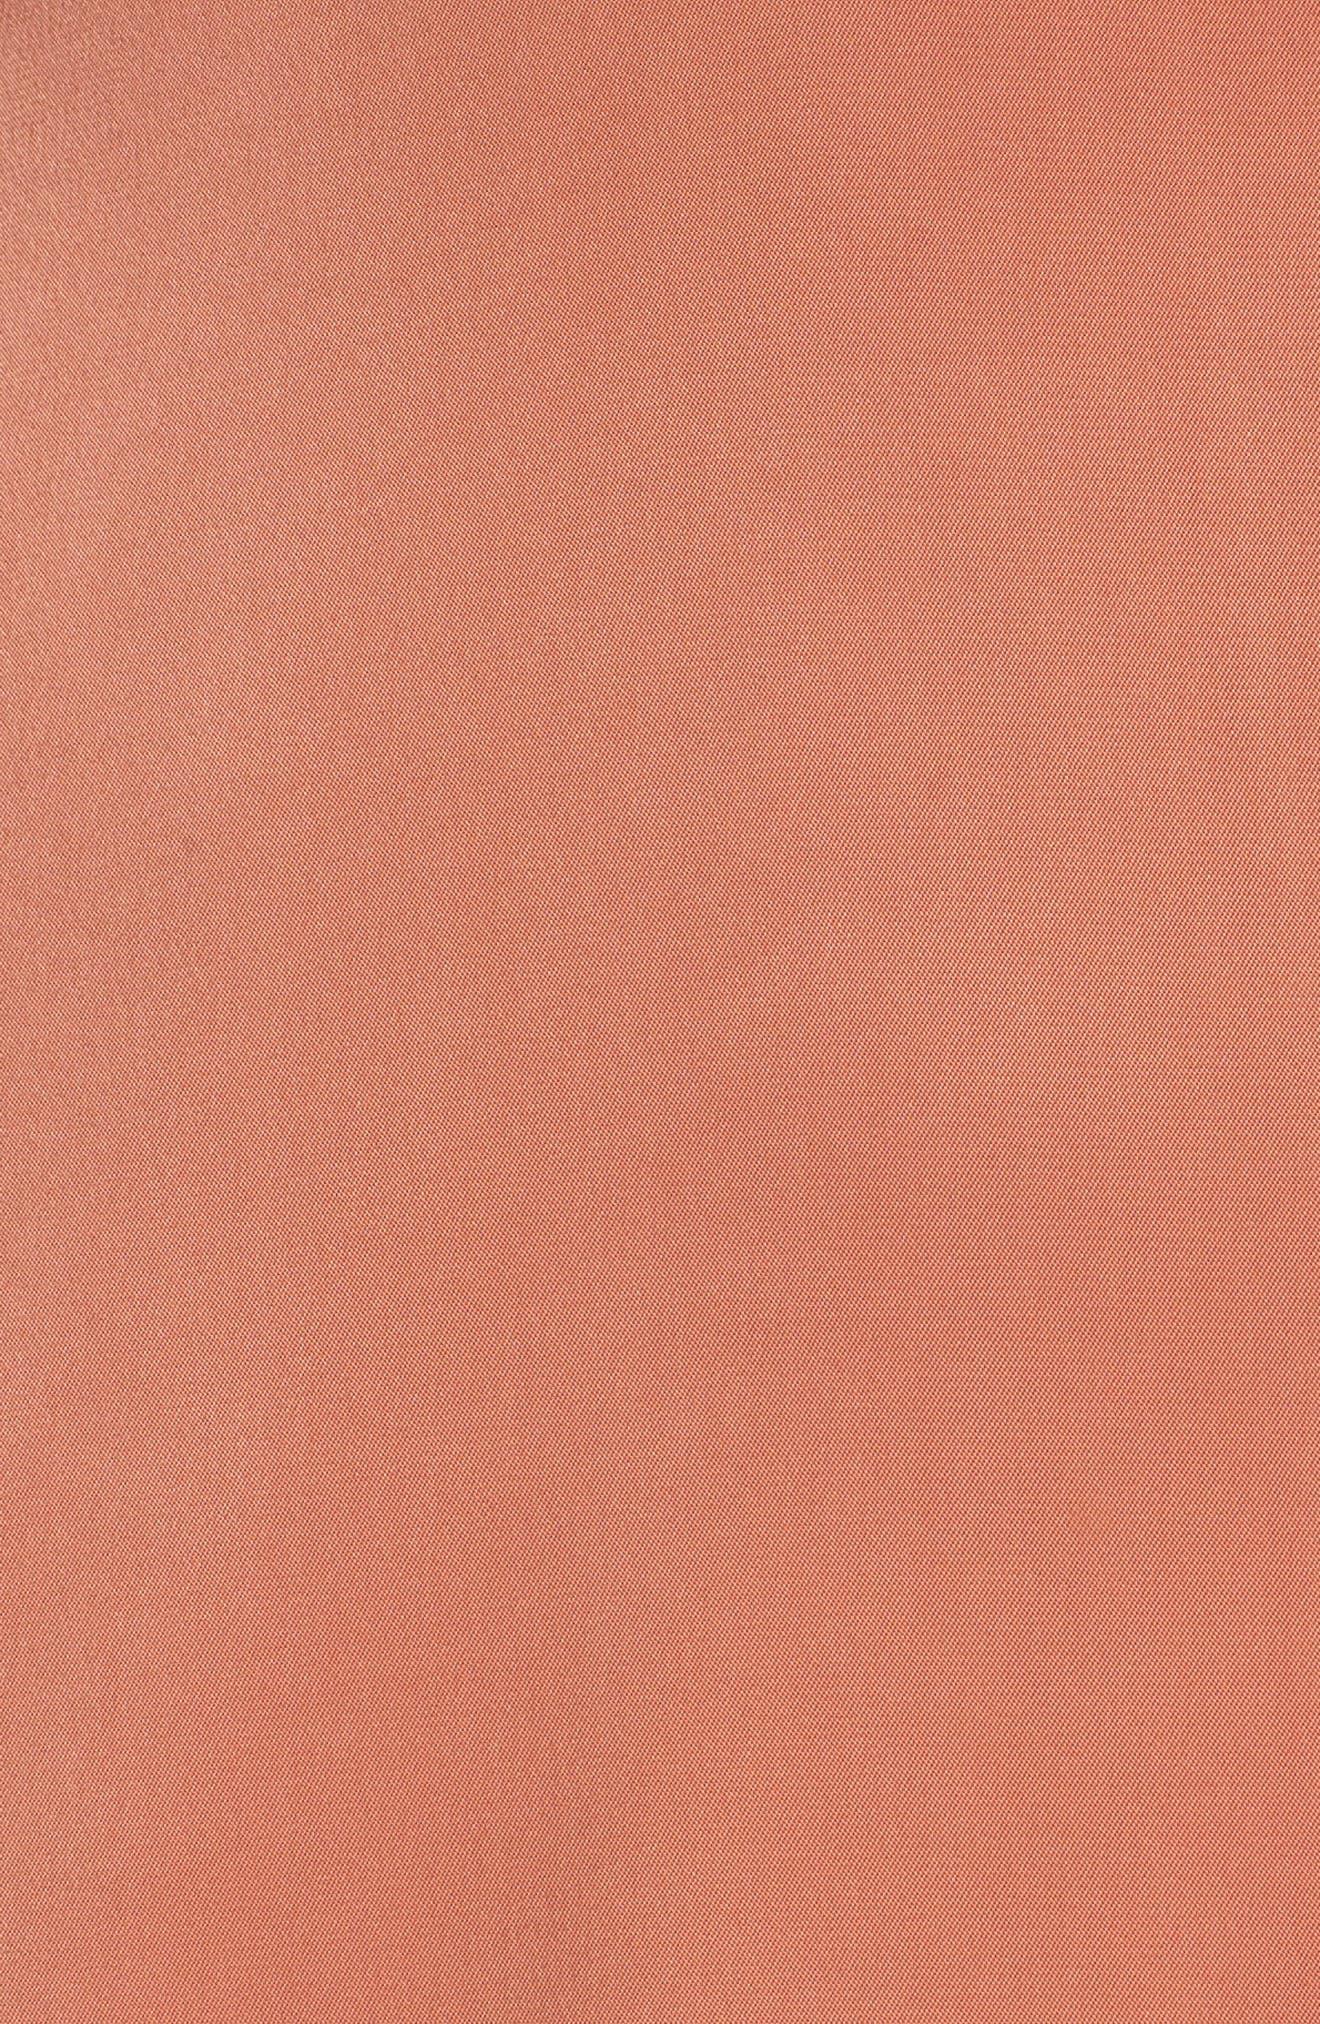 Lea Plunge Neck Midi Dress,                             Alternate thumbnail 5, color,                             TERRACOTTA